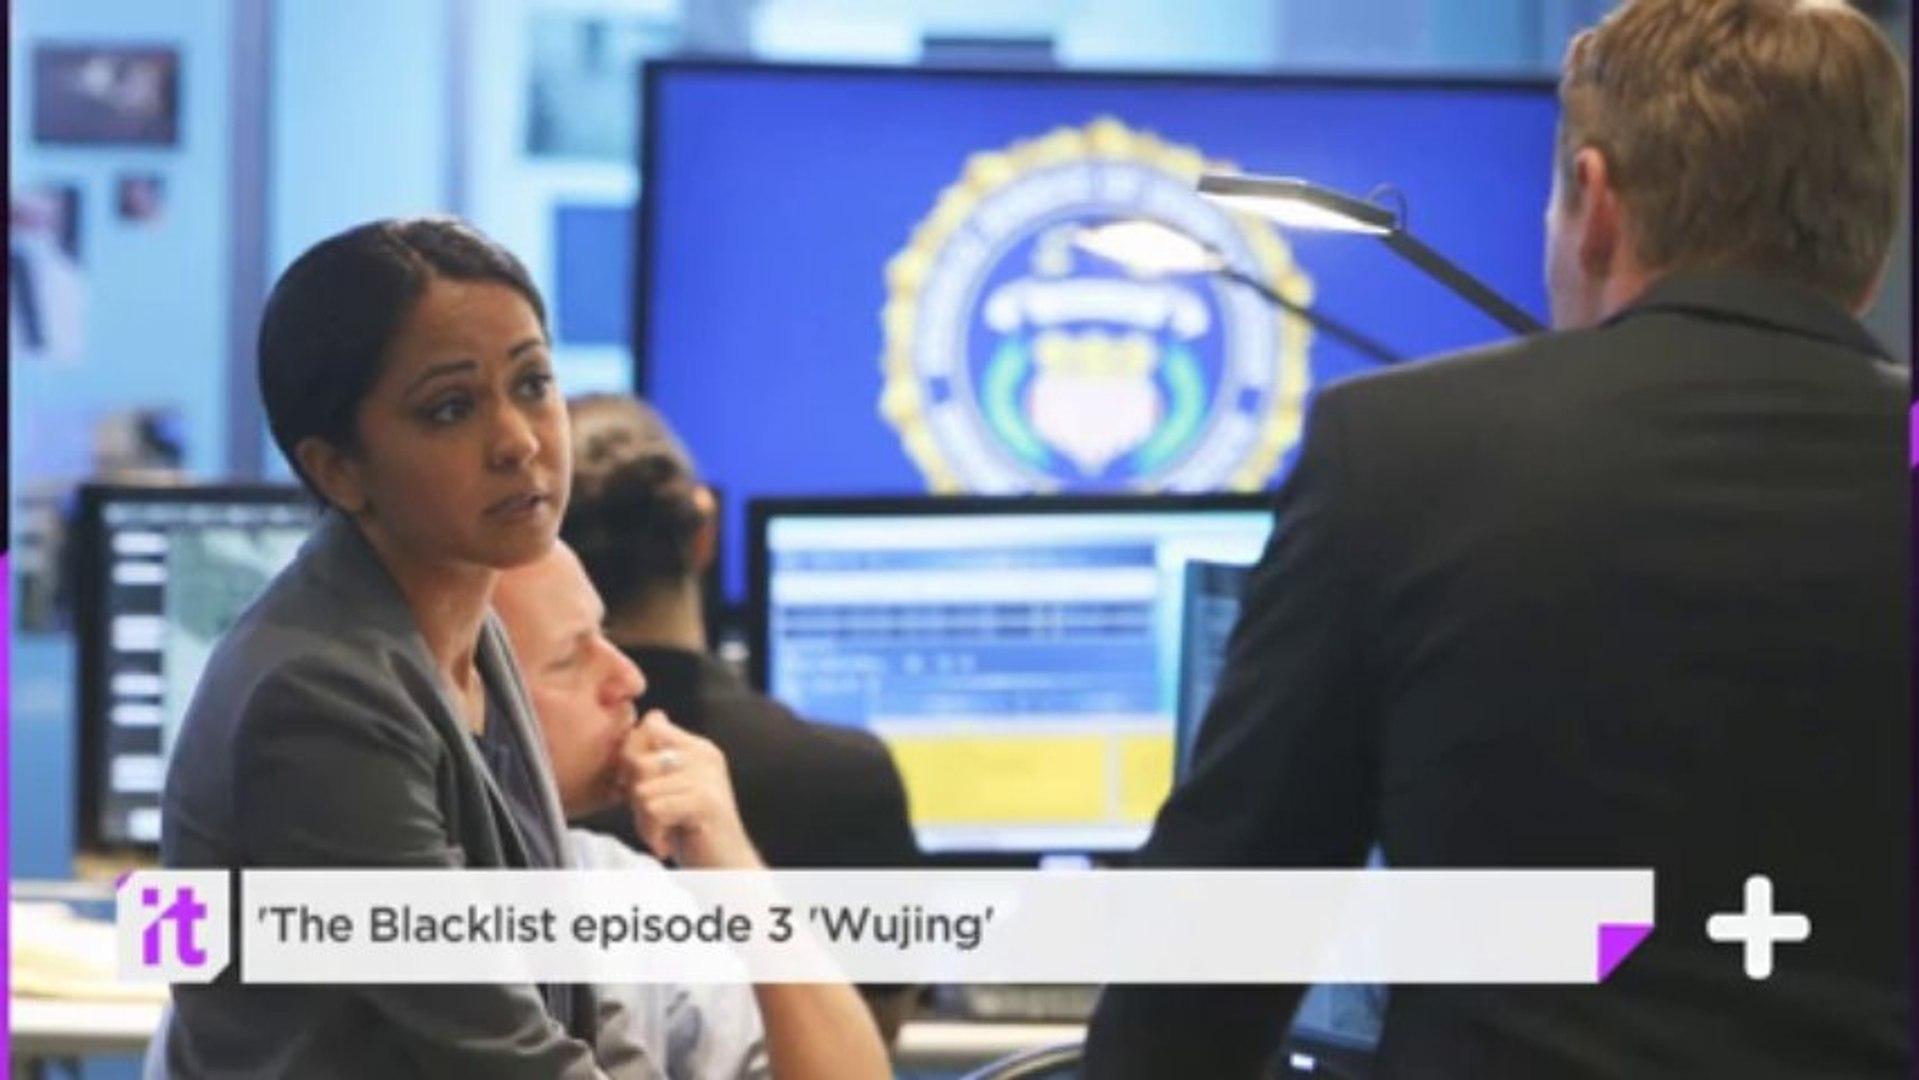 'The Blacklist Episode 3 'Wujing'